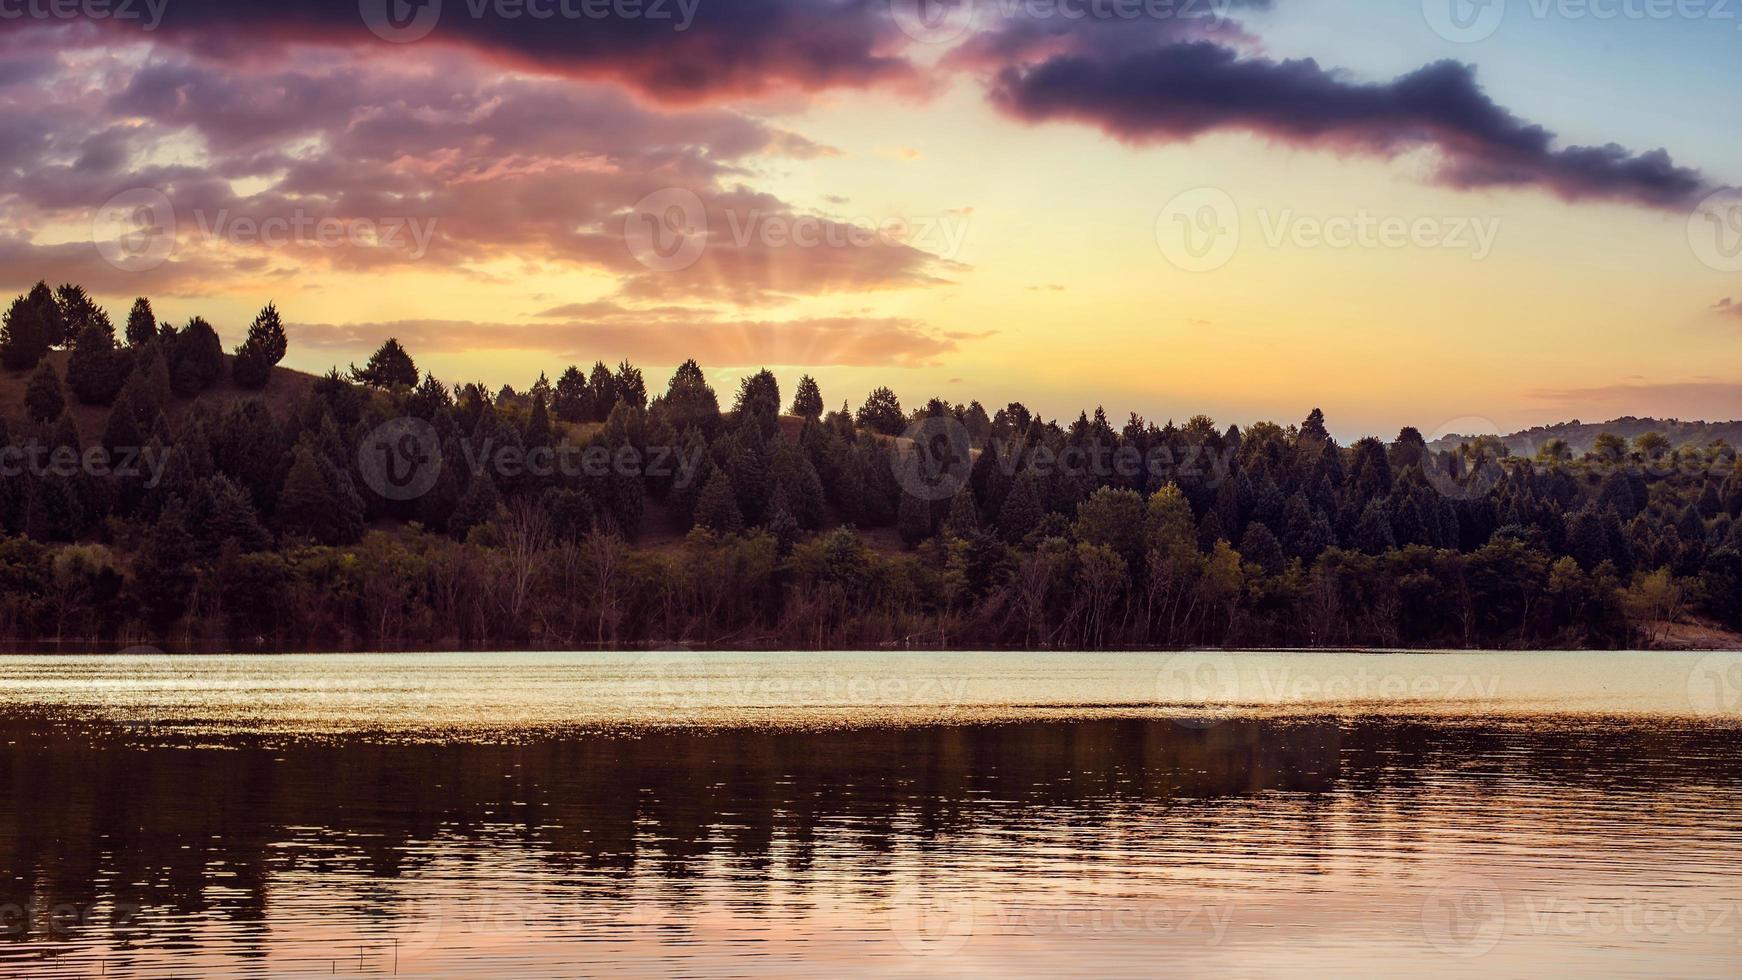 Sonnenaufgang am See mladost, Veles, Republik Nordmazedonien. foto